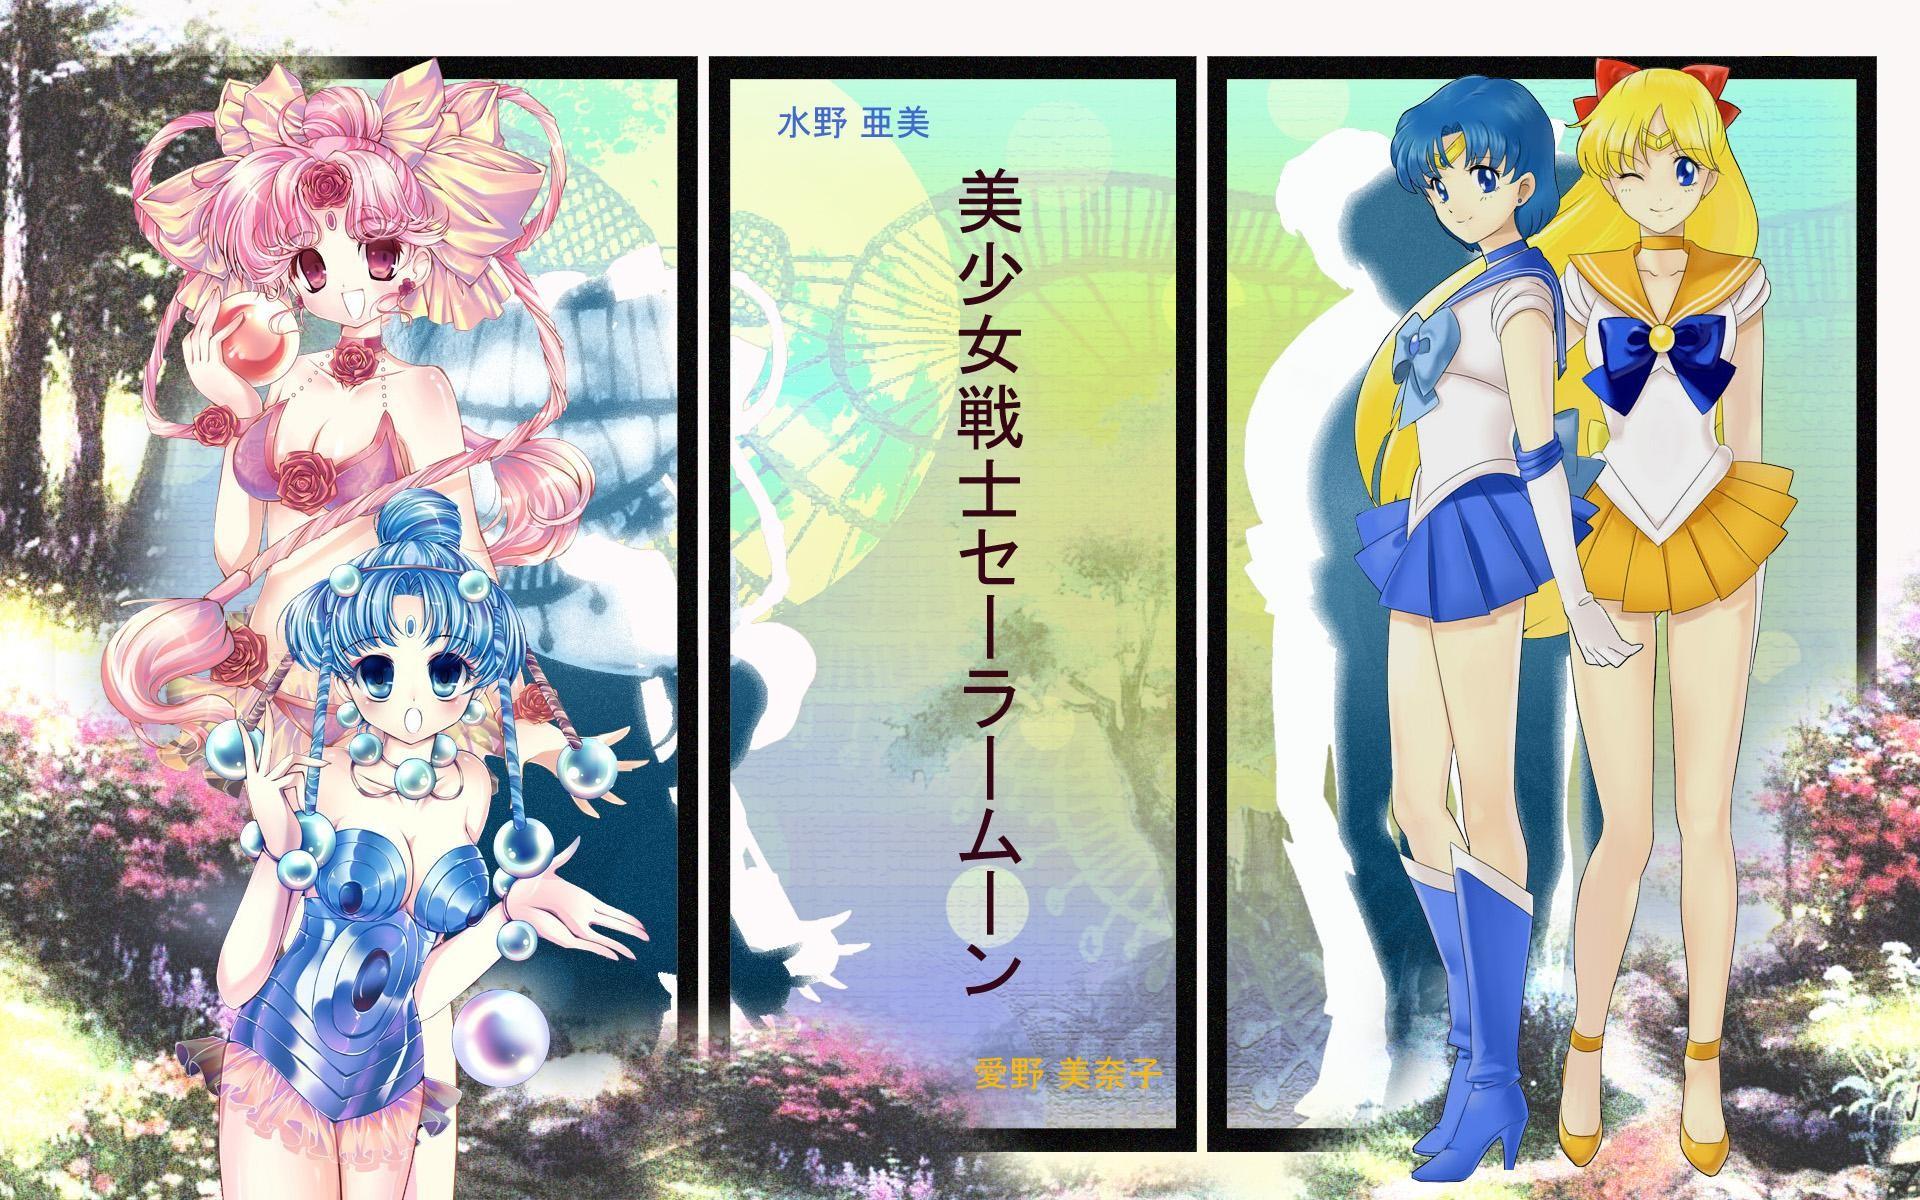 Iphone Sailor Moon Wallpaper - Sailor Mercury , HD Wallpaper & Backgrounds